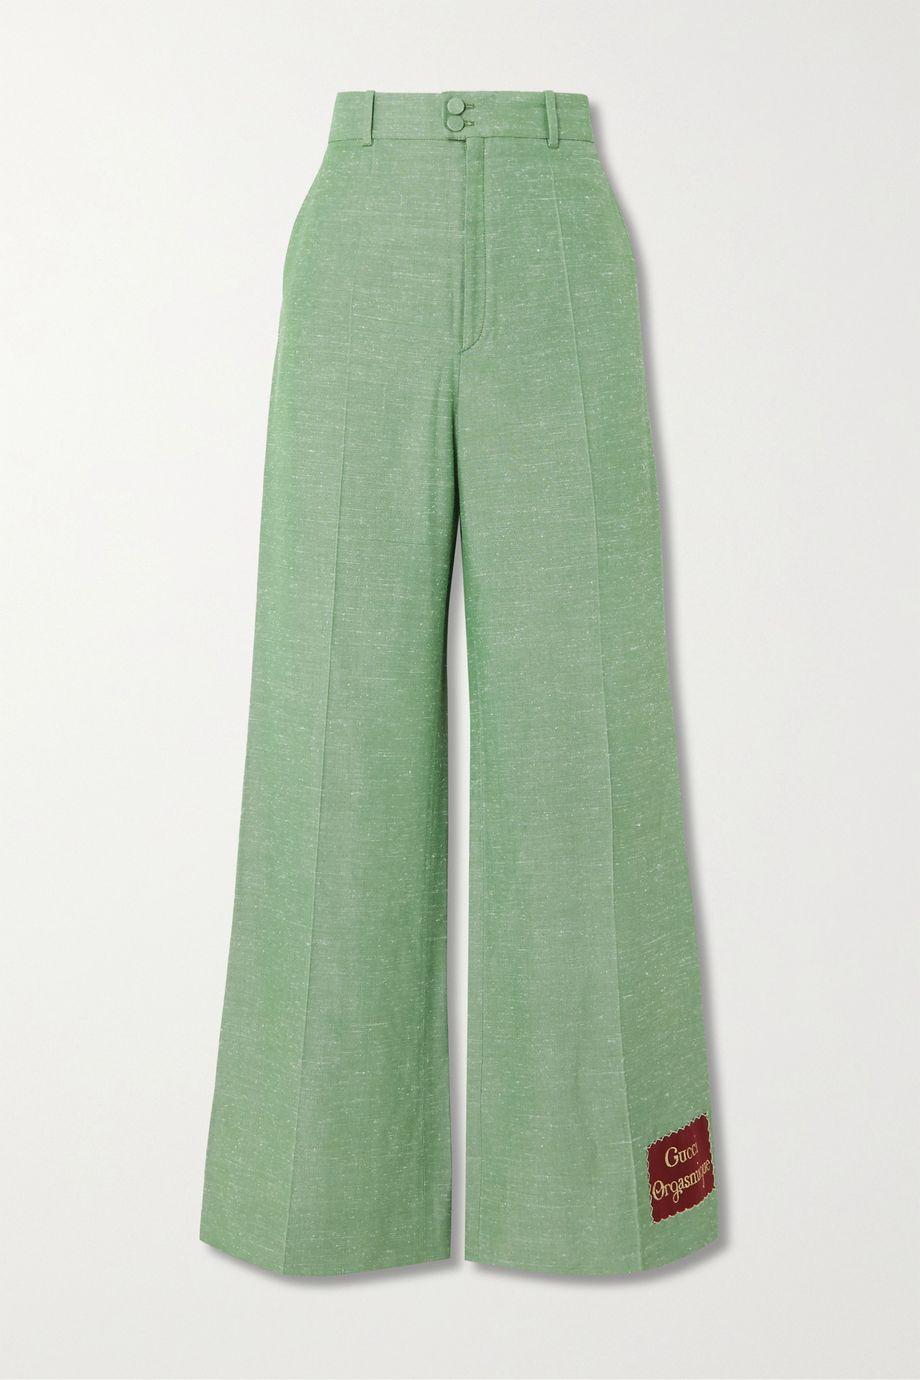 Gucci Appliquéd woven straight-leg pants